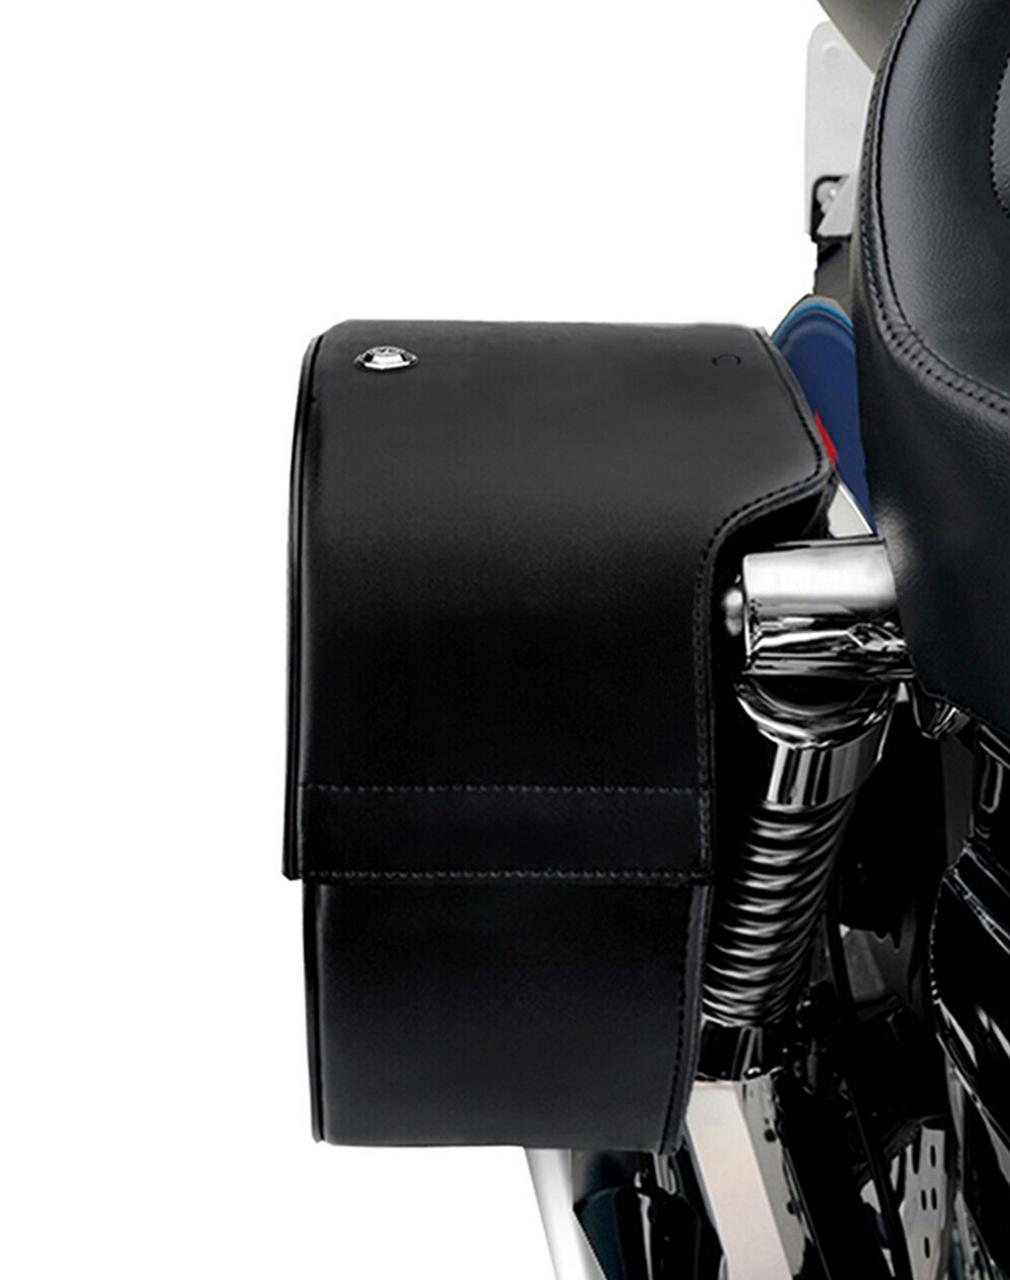 Honda VTX 1800 N SS Shock Cutout Slanted Studded L Motorcycle Saddlebags Shock Cutout View